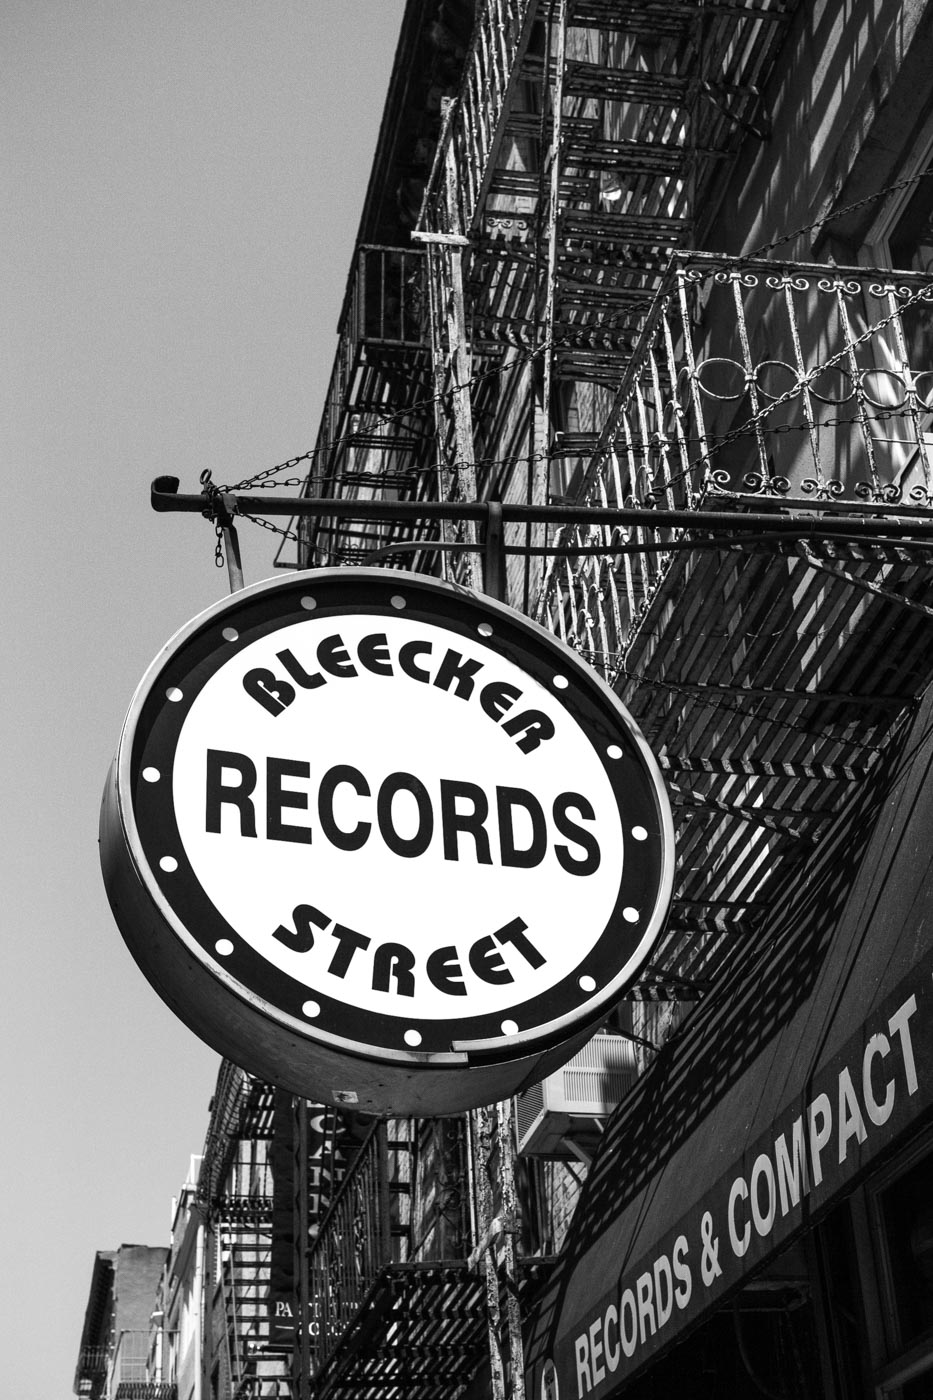 Bleecker Records